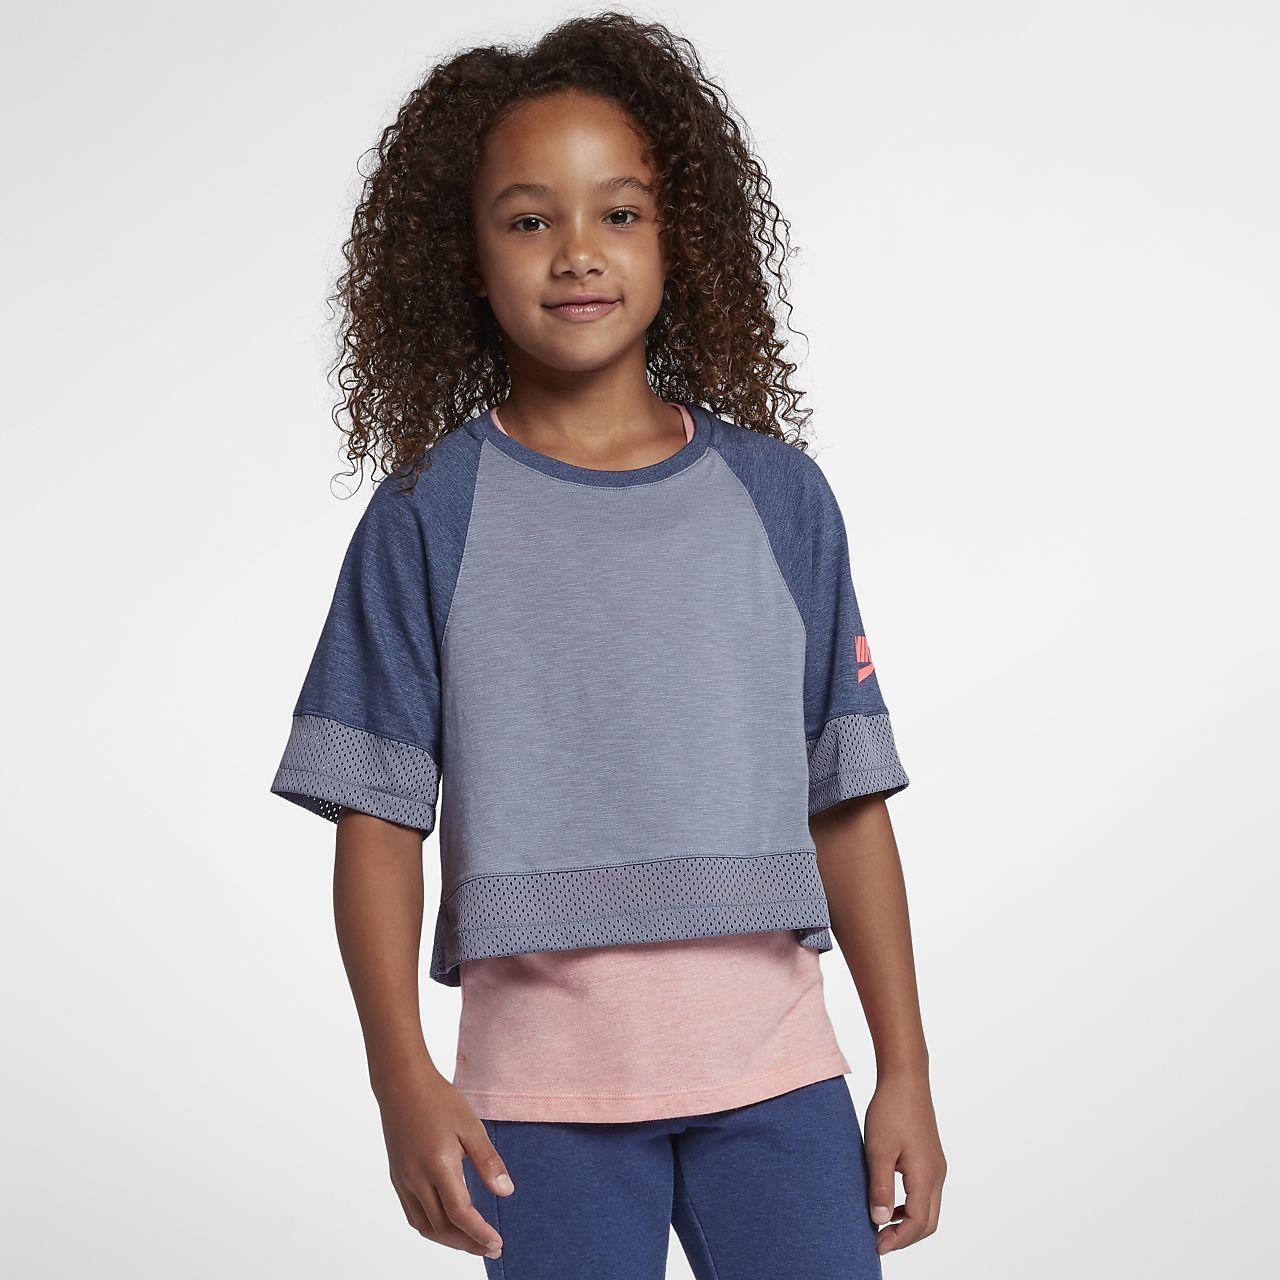 194281335ff Nike Sportswear Big Kids' (Girls') Short-Sleeve Crop Top. Nike.com